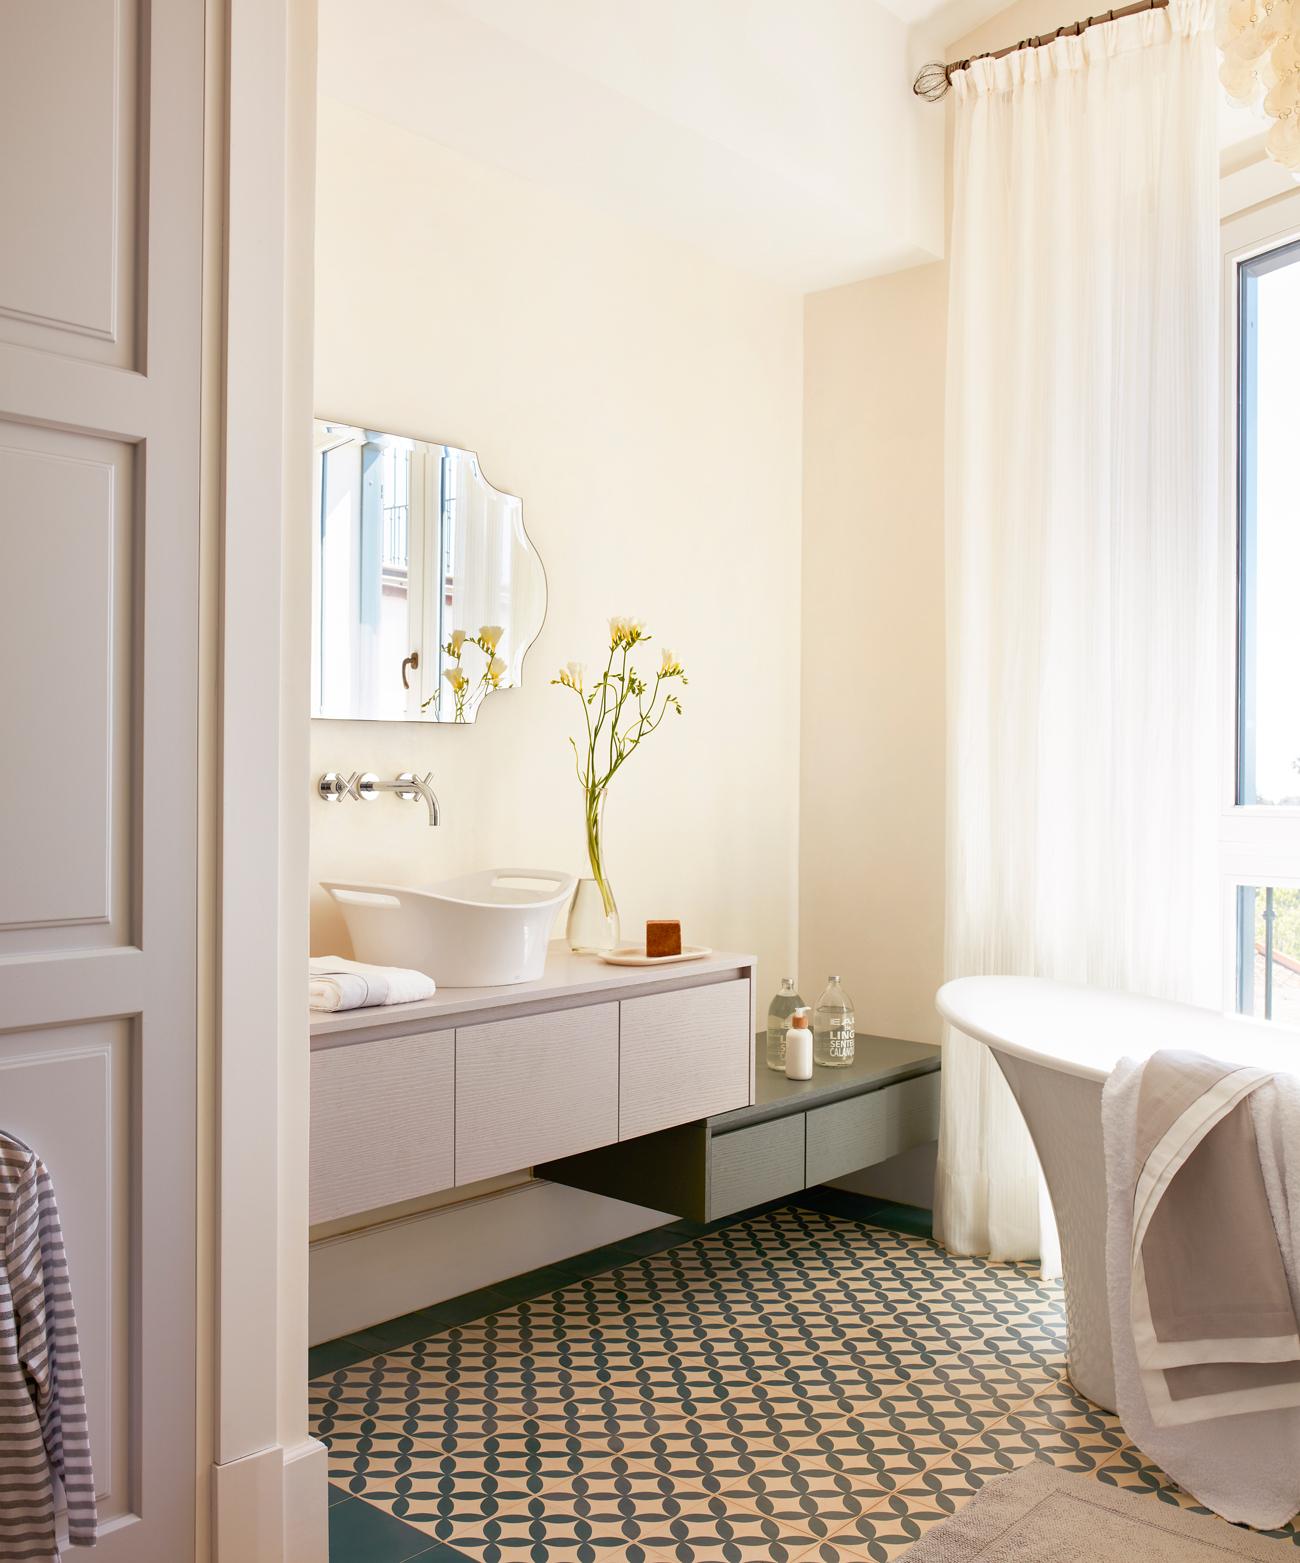 Un lavamanos para cada ba o Estilo clasico renovado